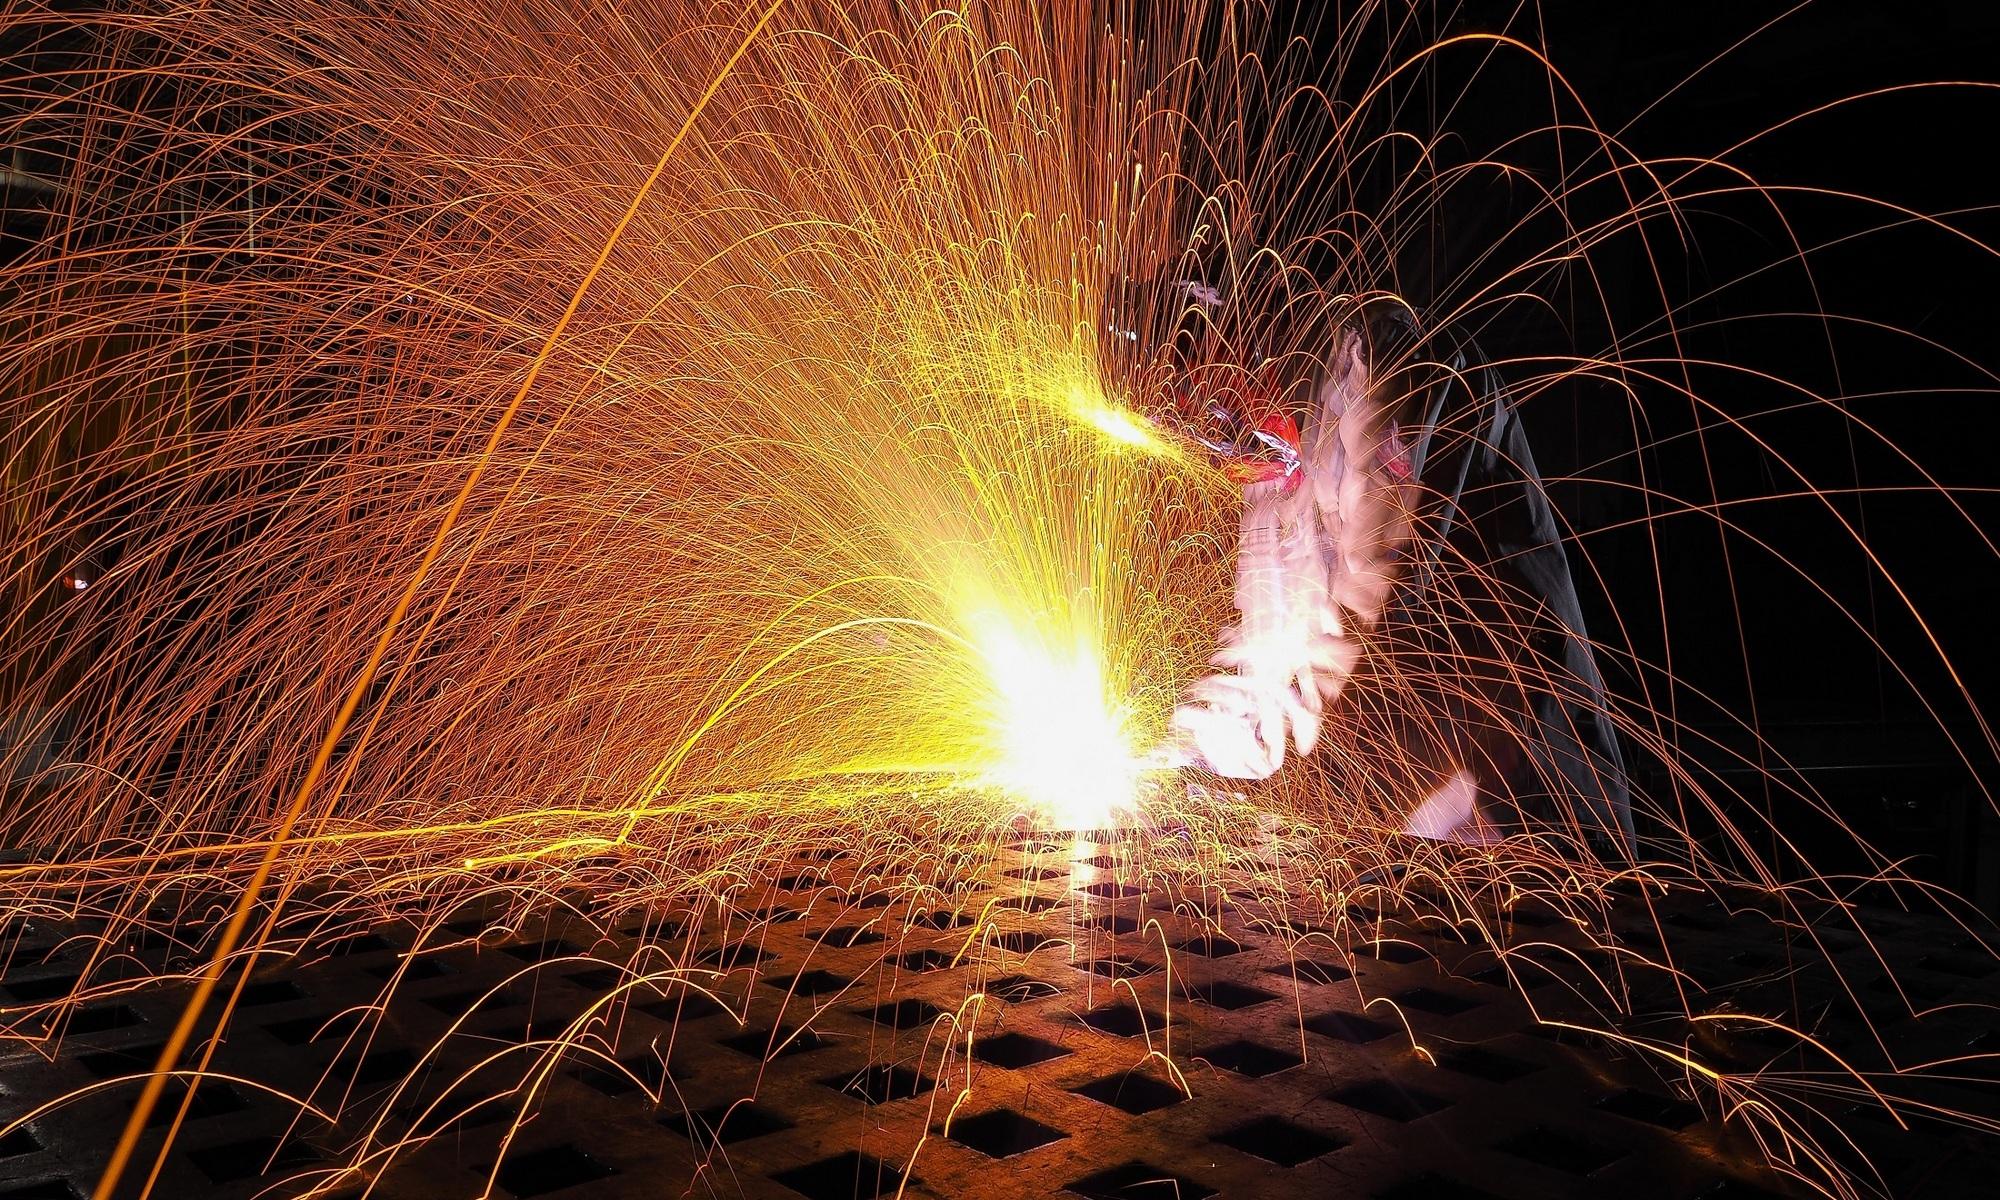 shelly_scientific_custom_industrial_equipment_6